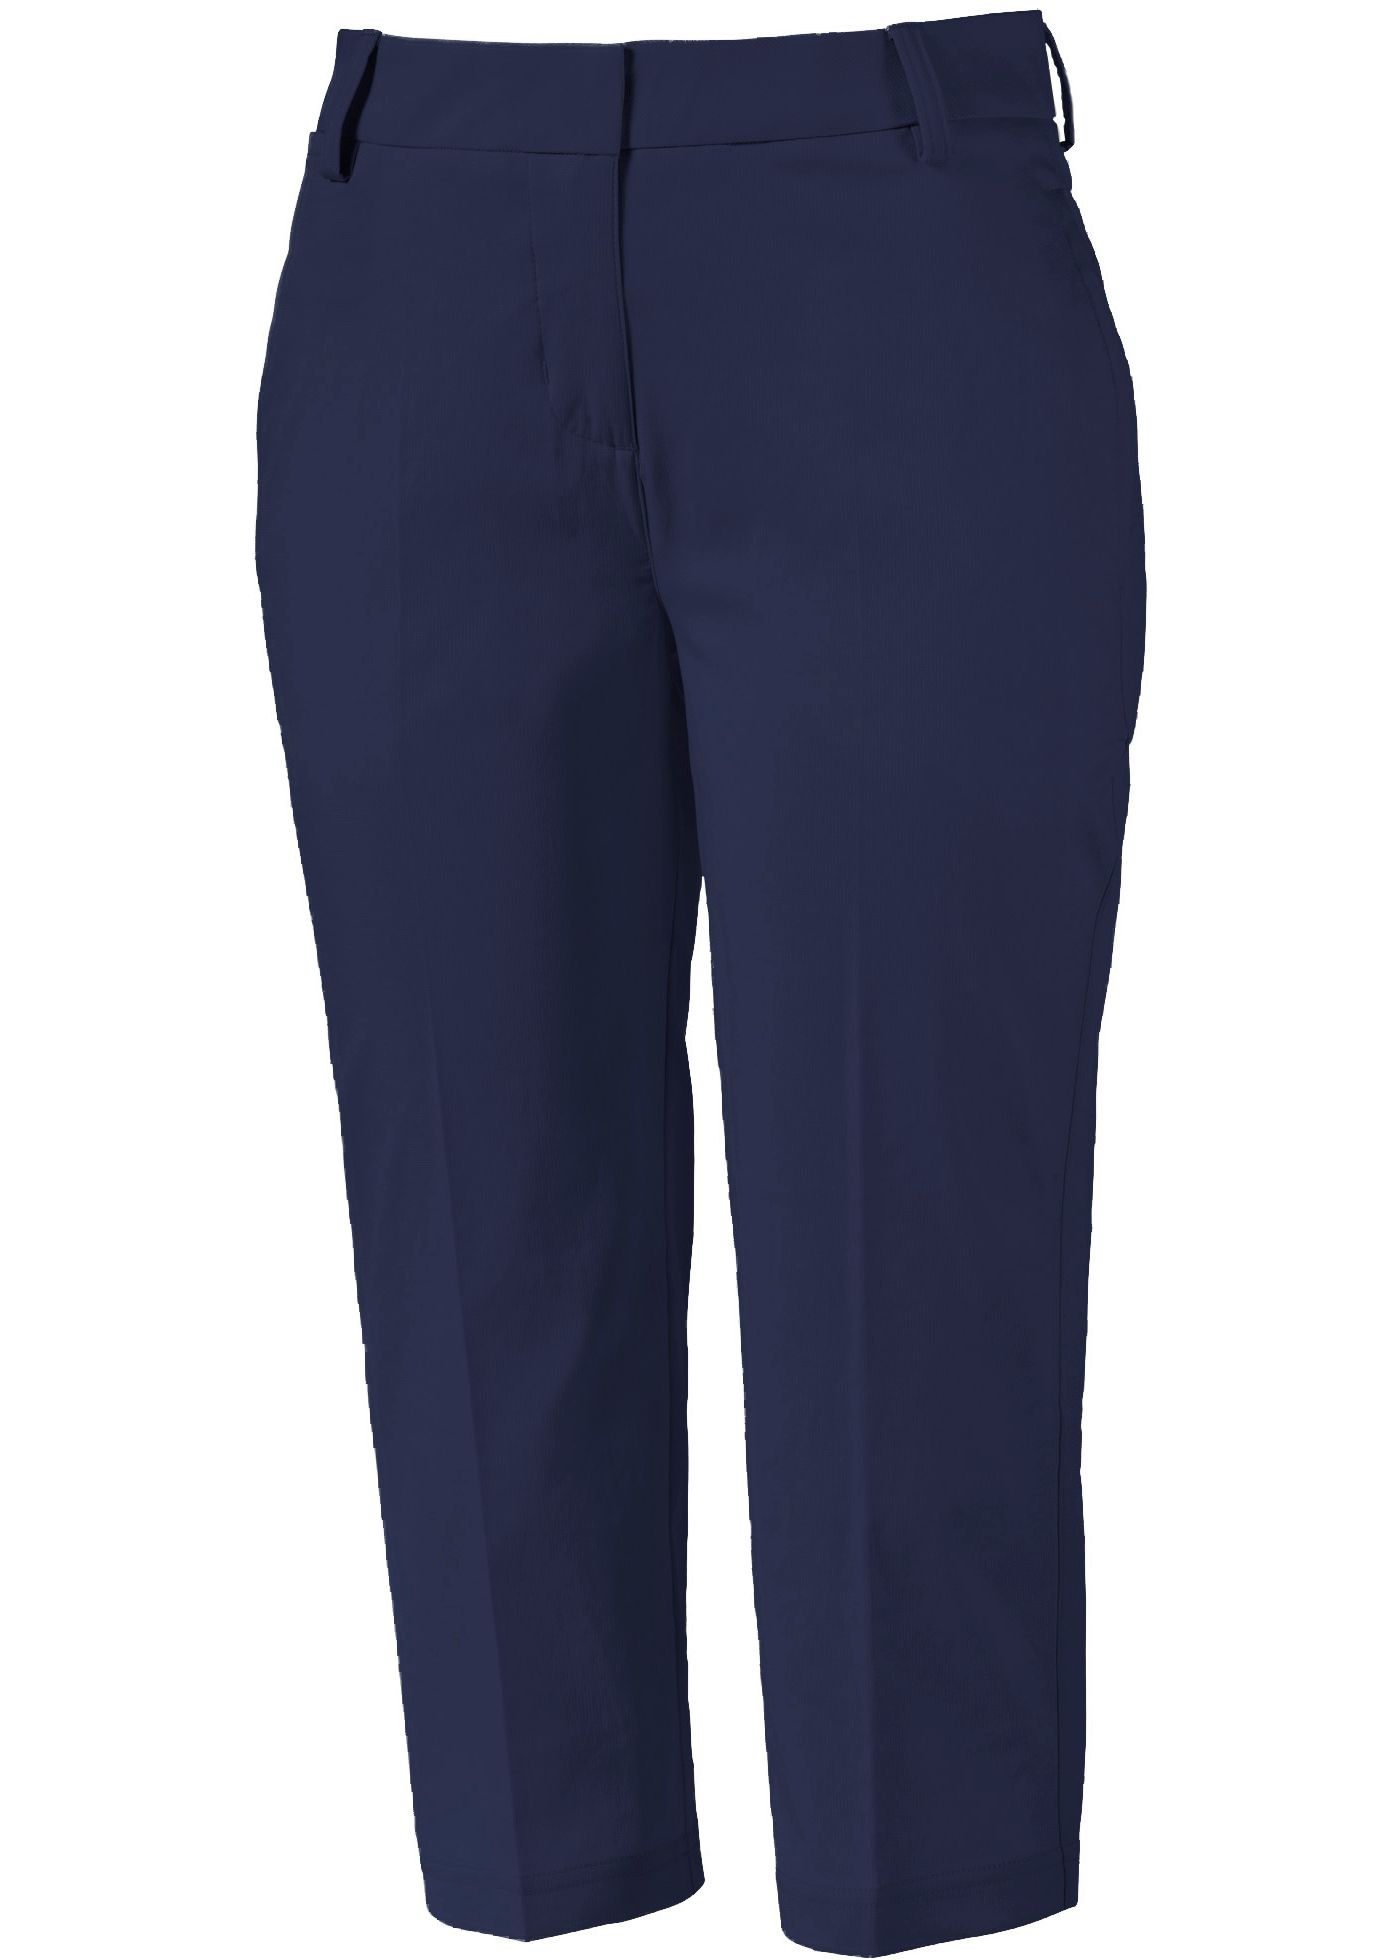 PUMA Women's Pounce Capri Golf Pants